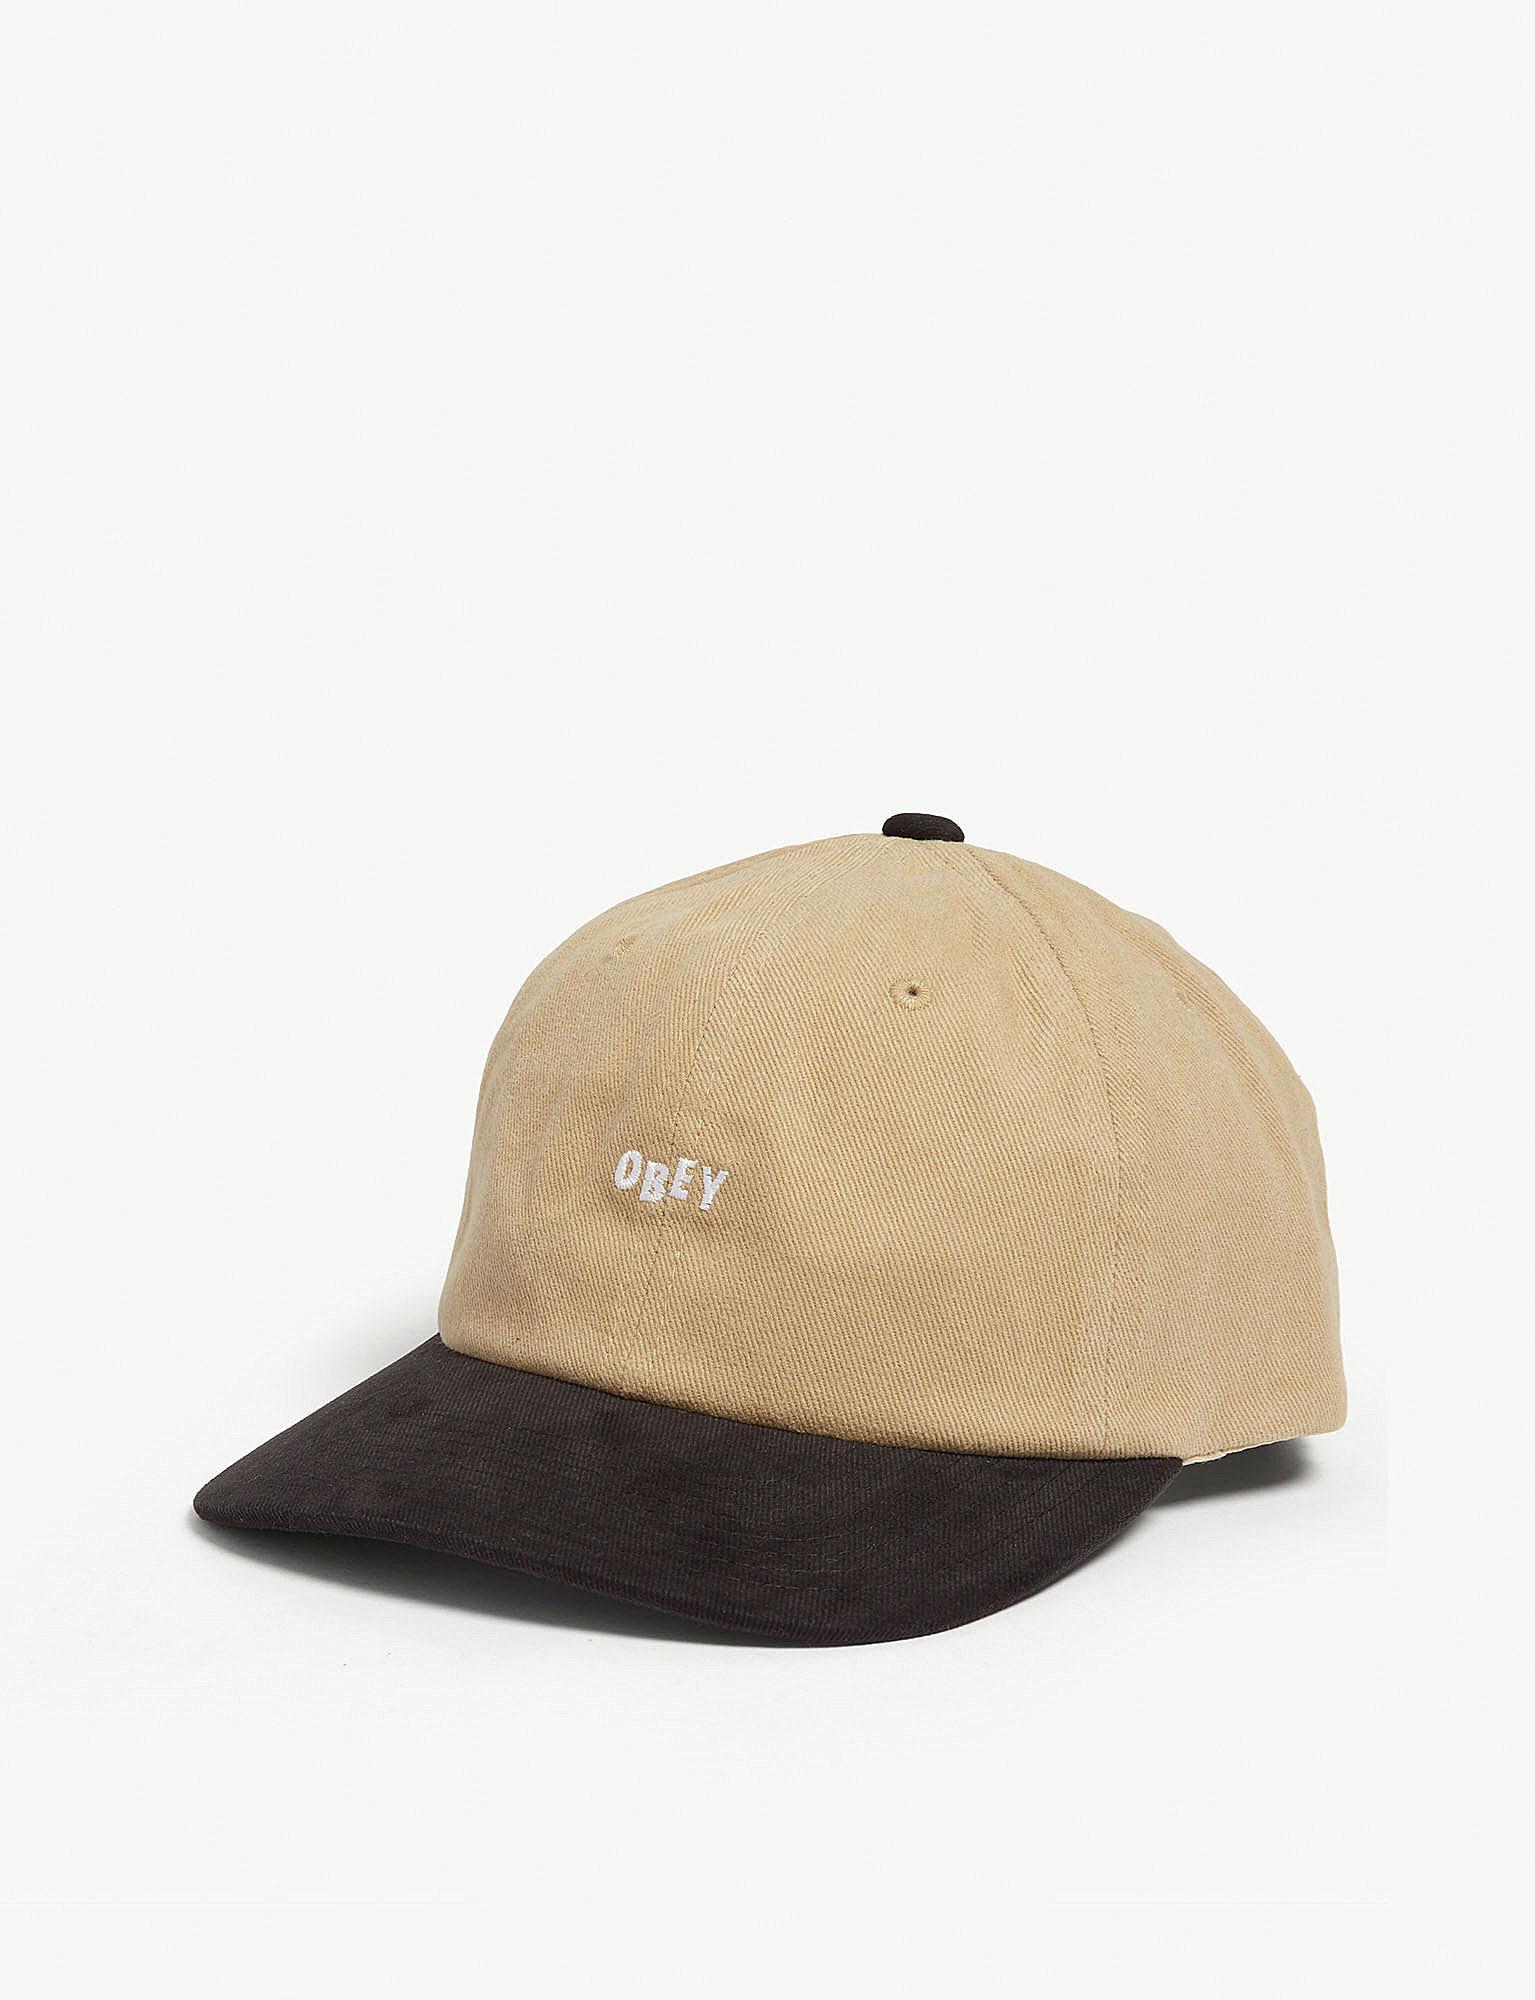 094af204e01 Lyst - Obey Jumble Cotton Snapback Cap in Natural for Men